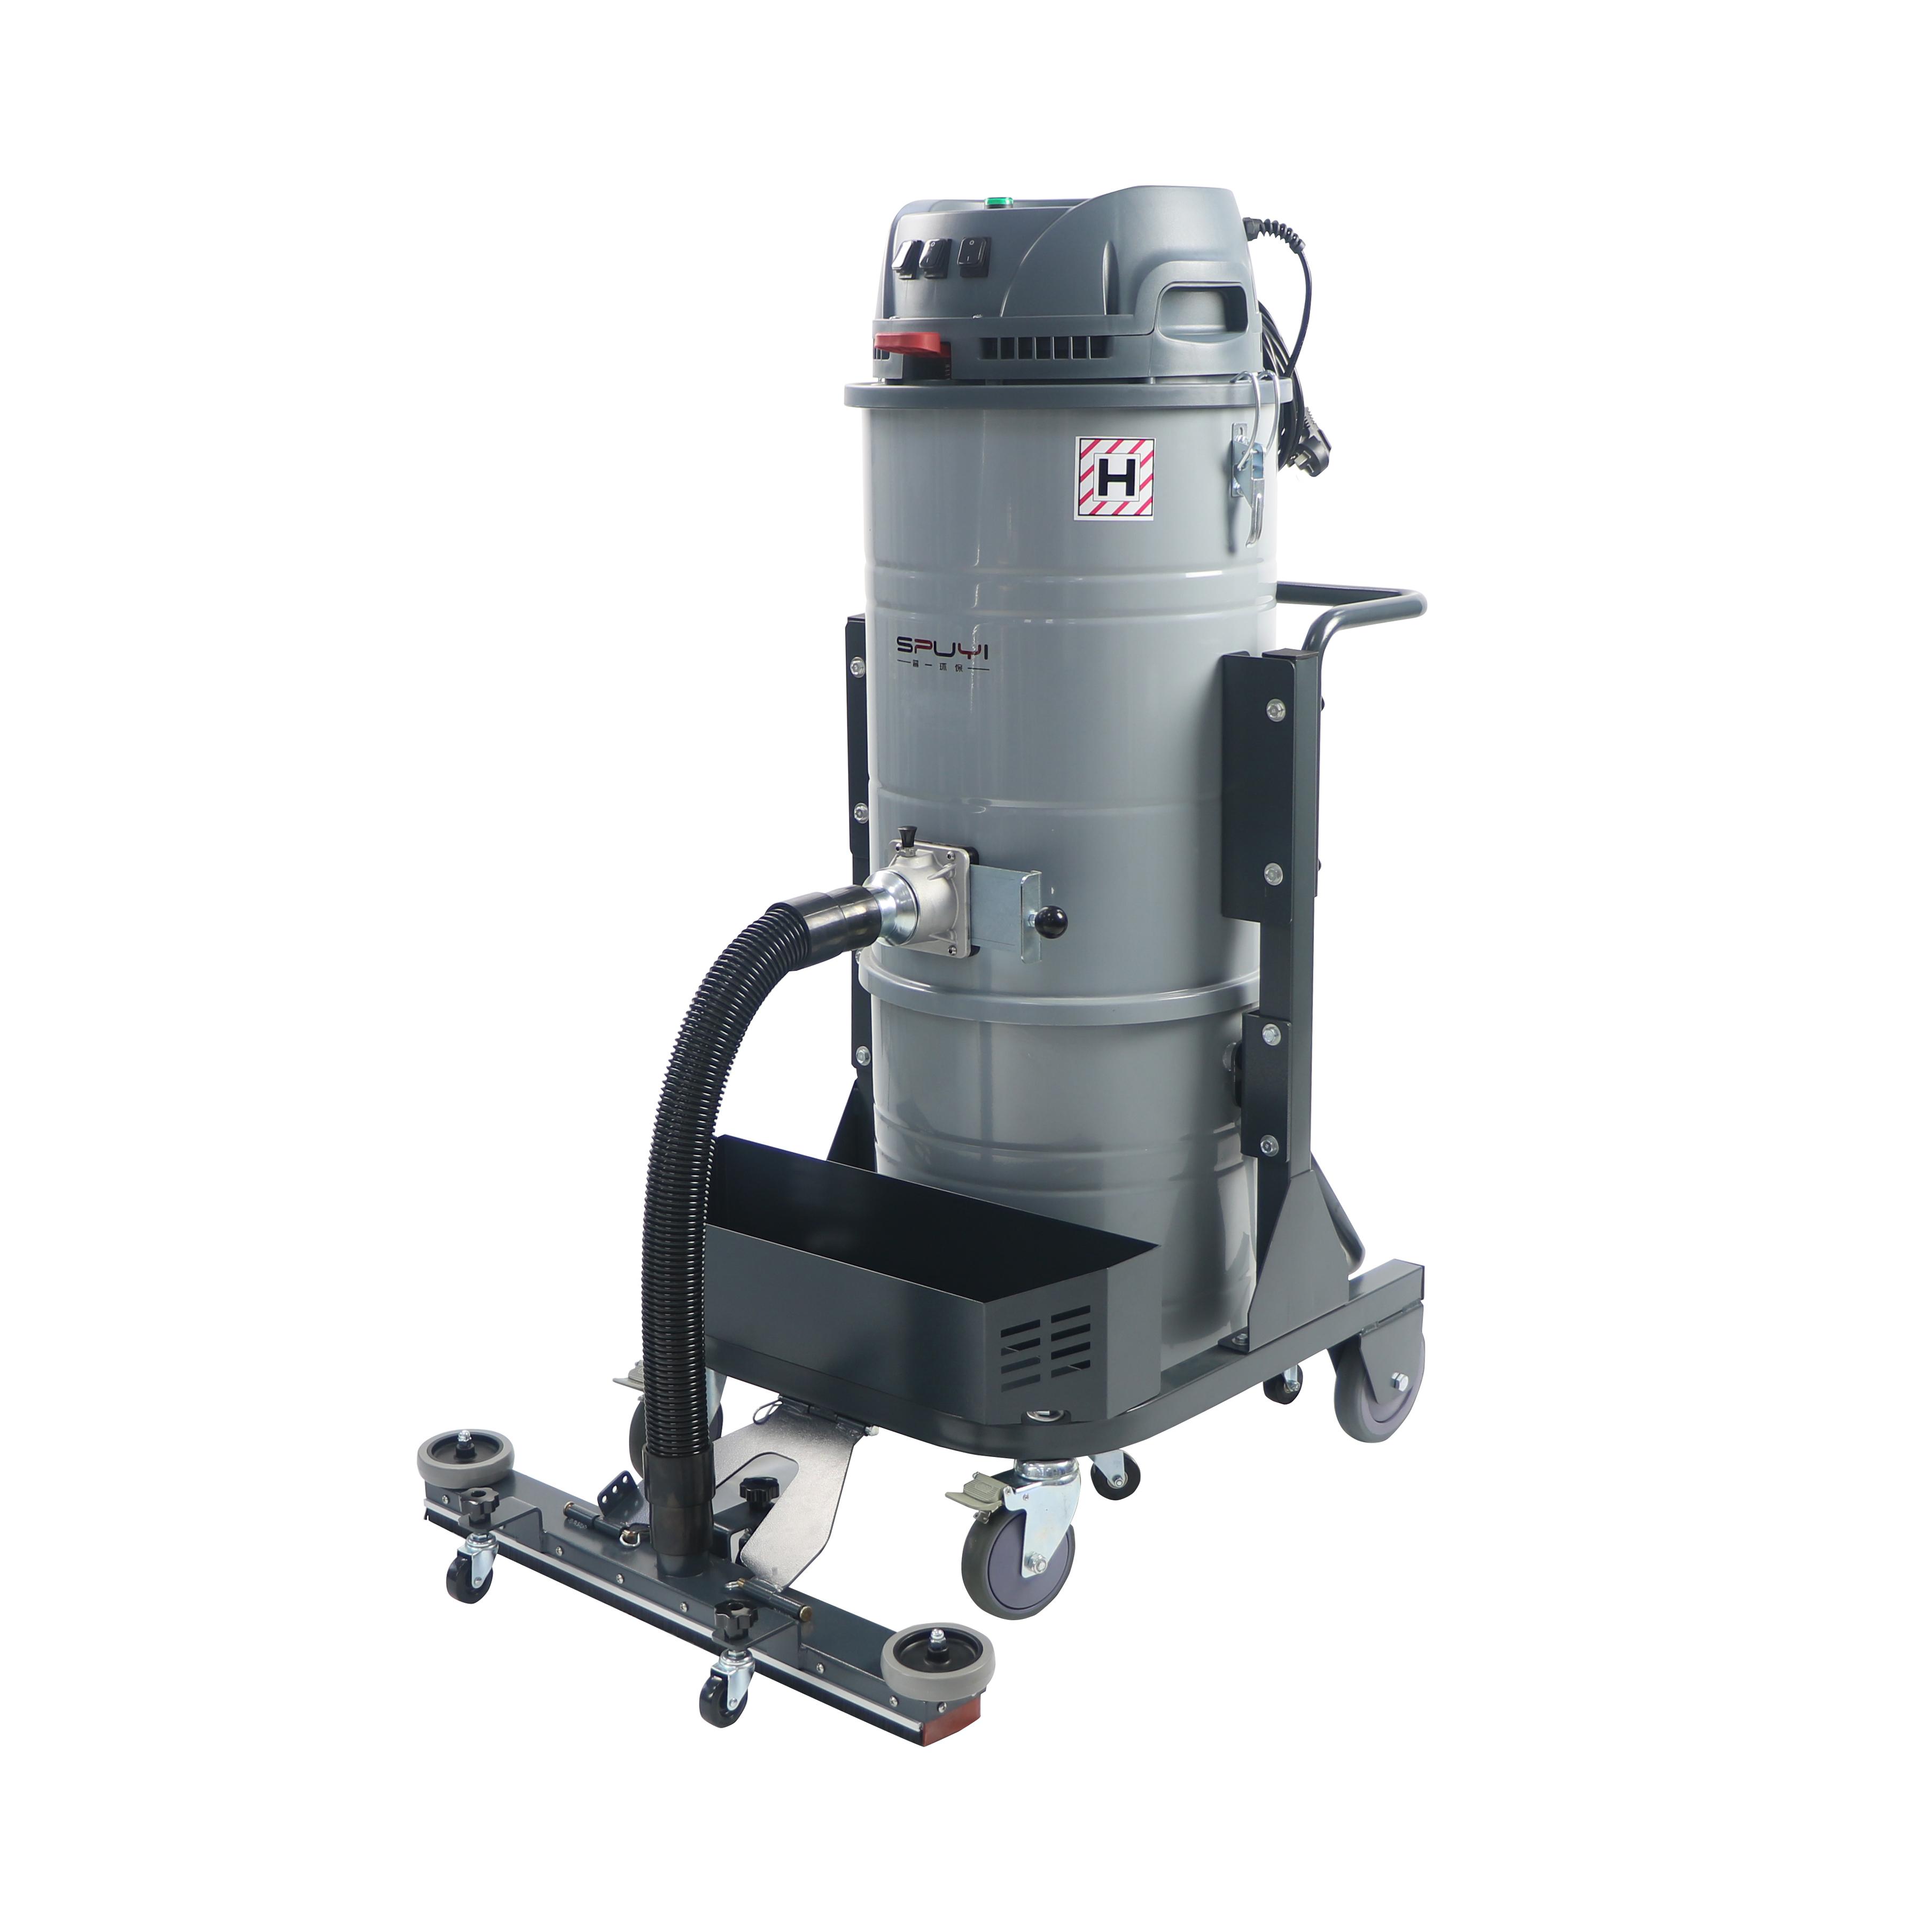 PY3 Series―Single Phase Industrial Vacuum Cleaner